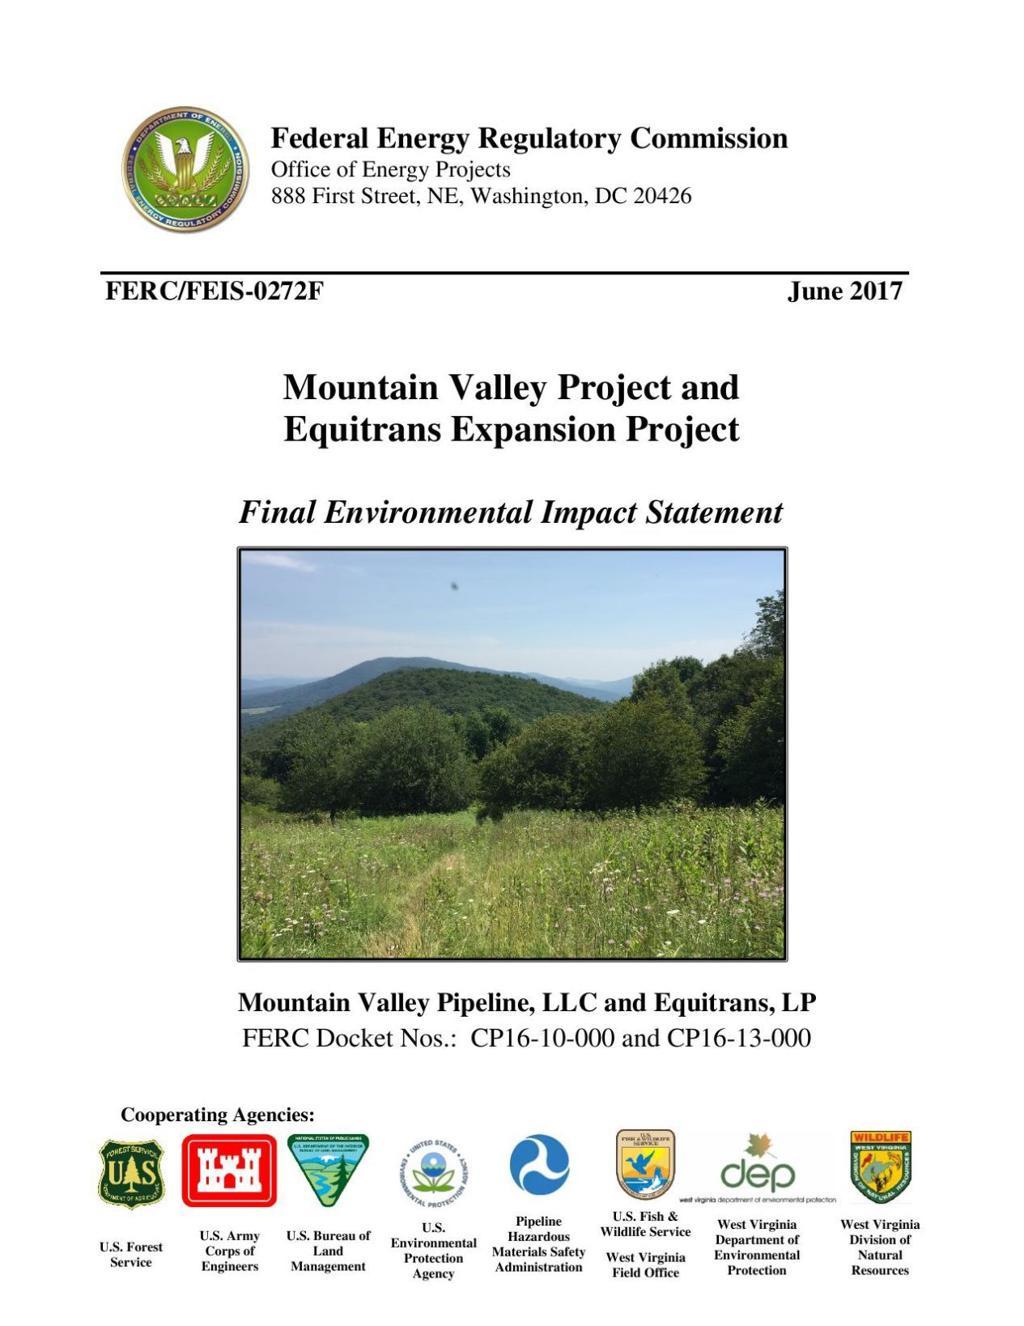 FERC's final environmental impact statement for Mountain